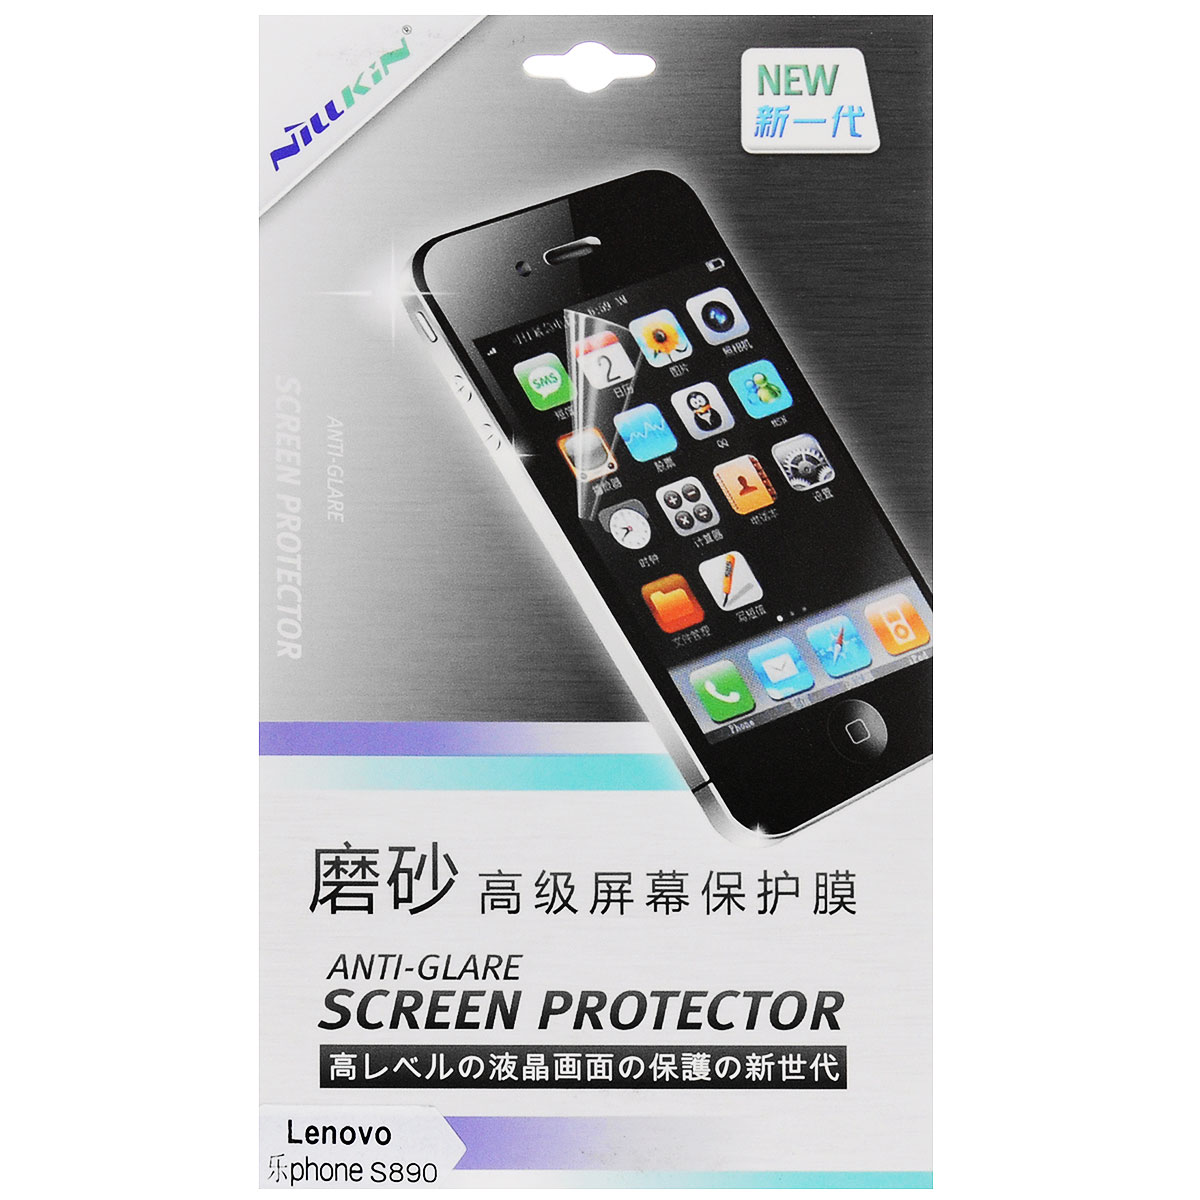 Nillkin Screen Protector защитная пленка для Lenovo S890, матовая